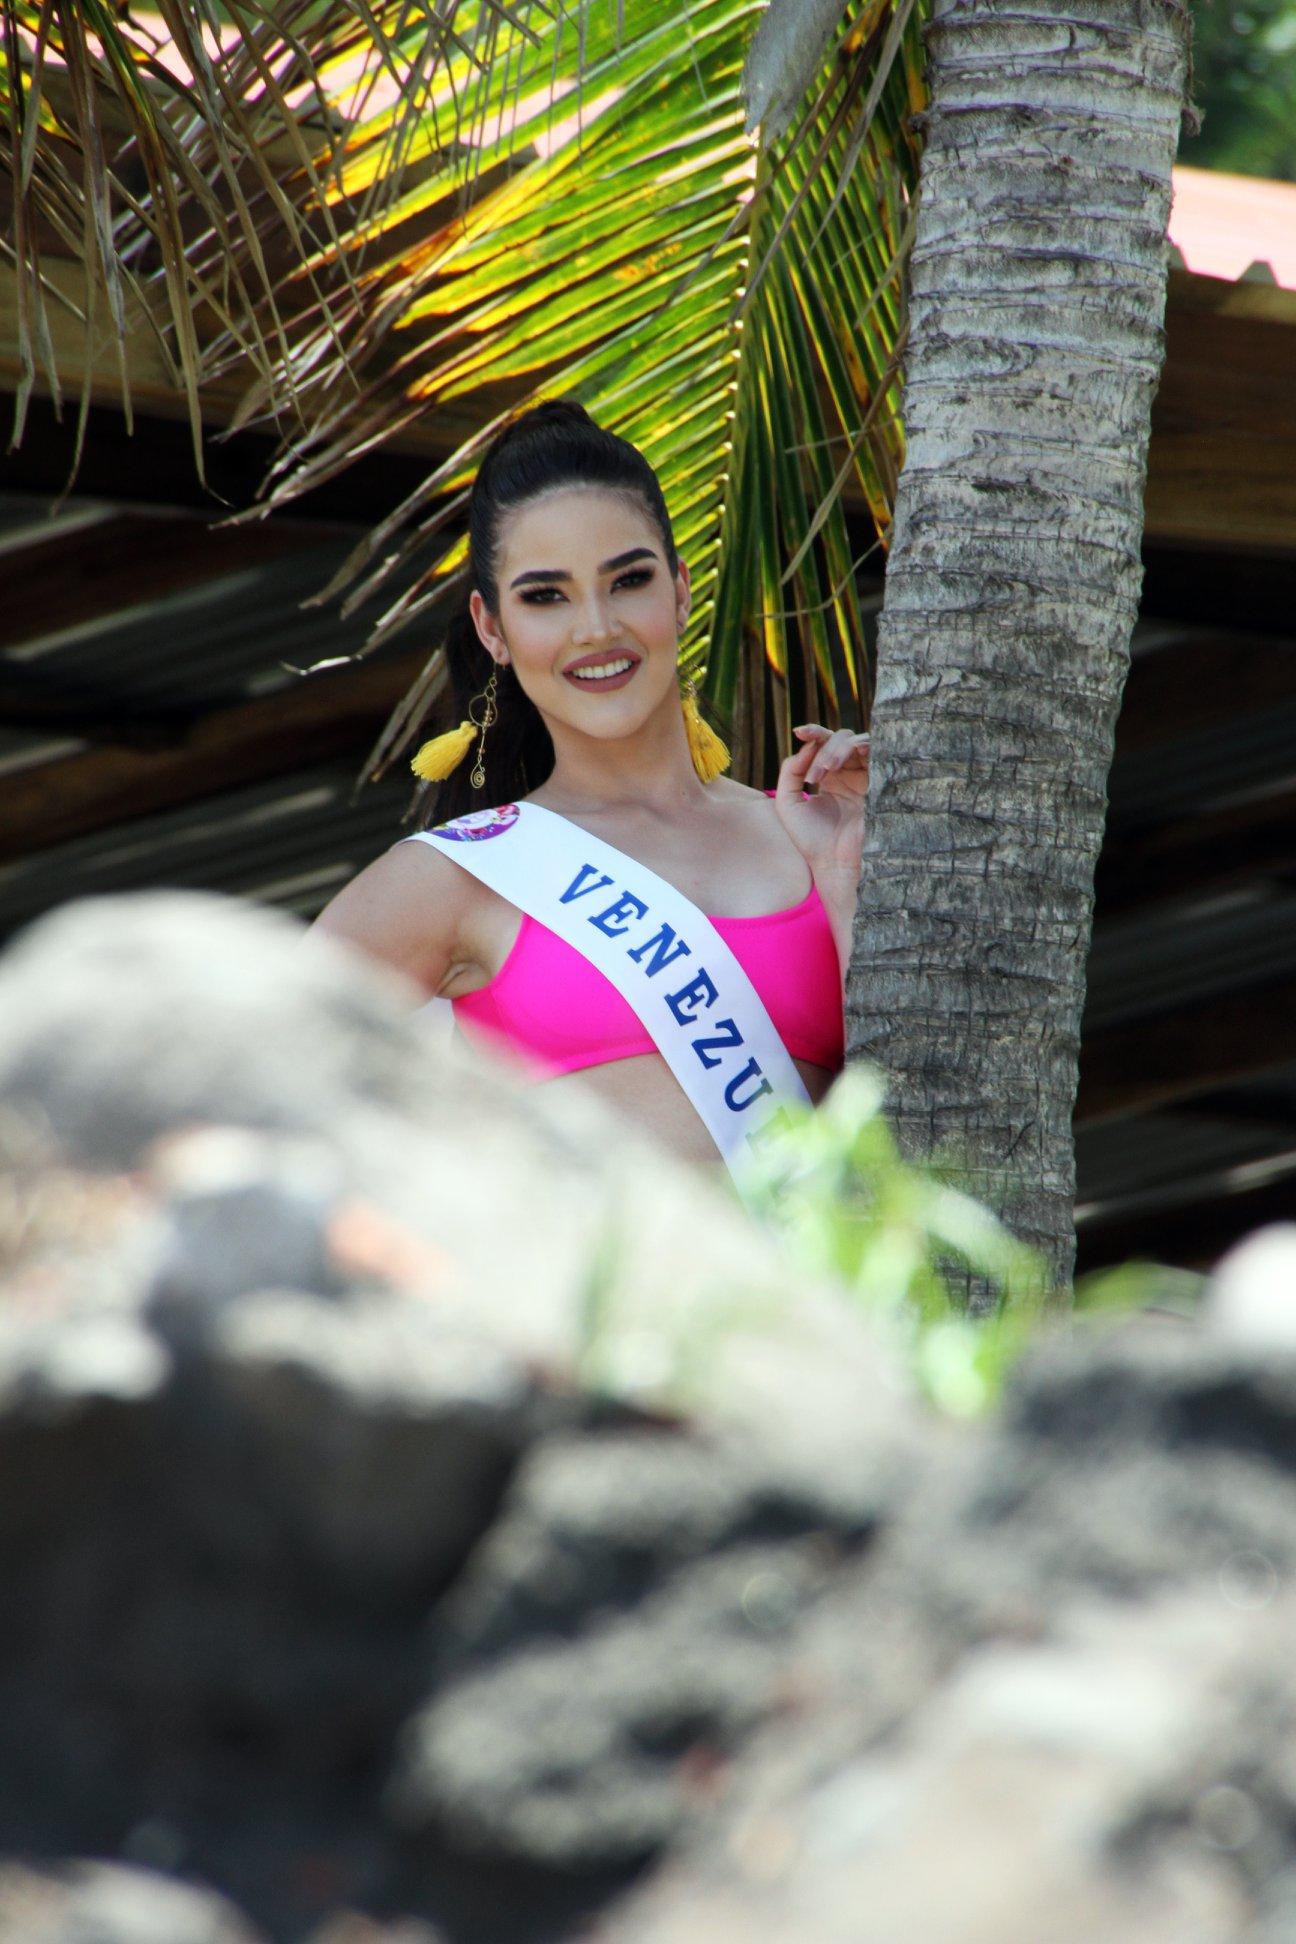 daniela di venere, top 12 de miss teen mundial 2019. - Página 5 60737210